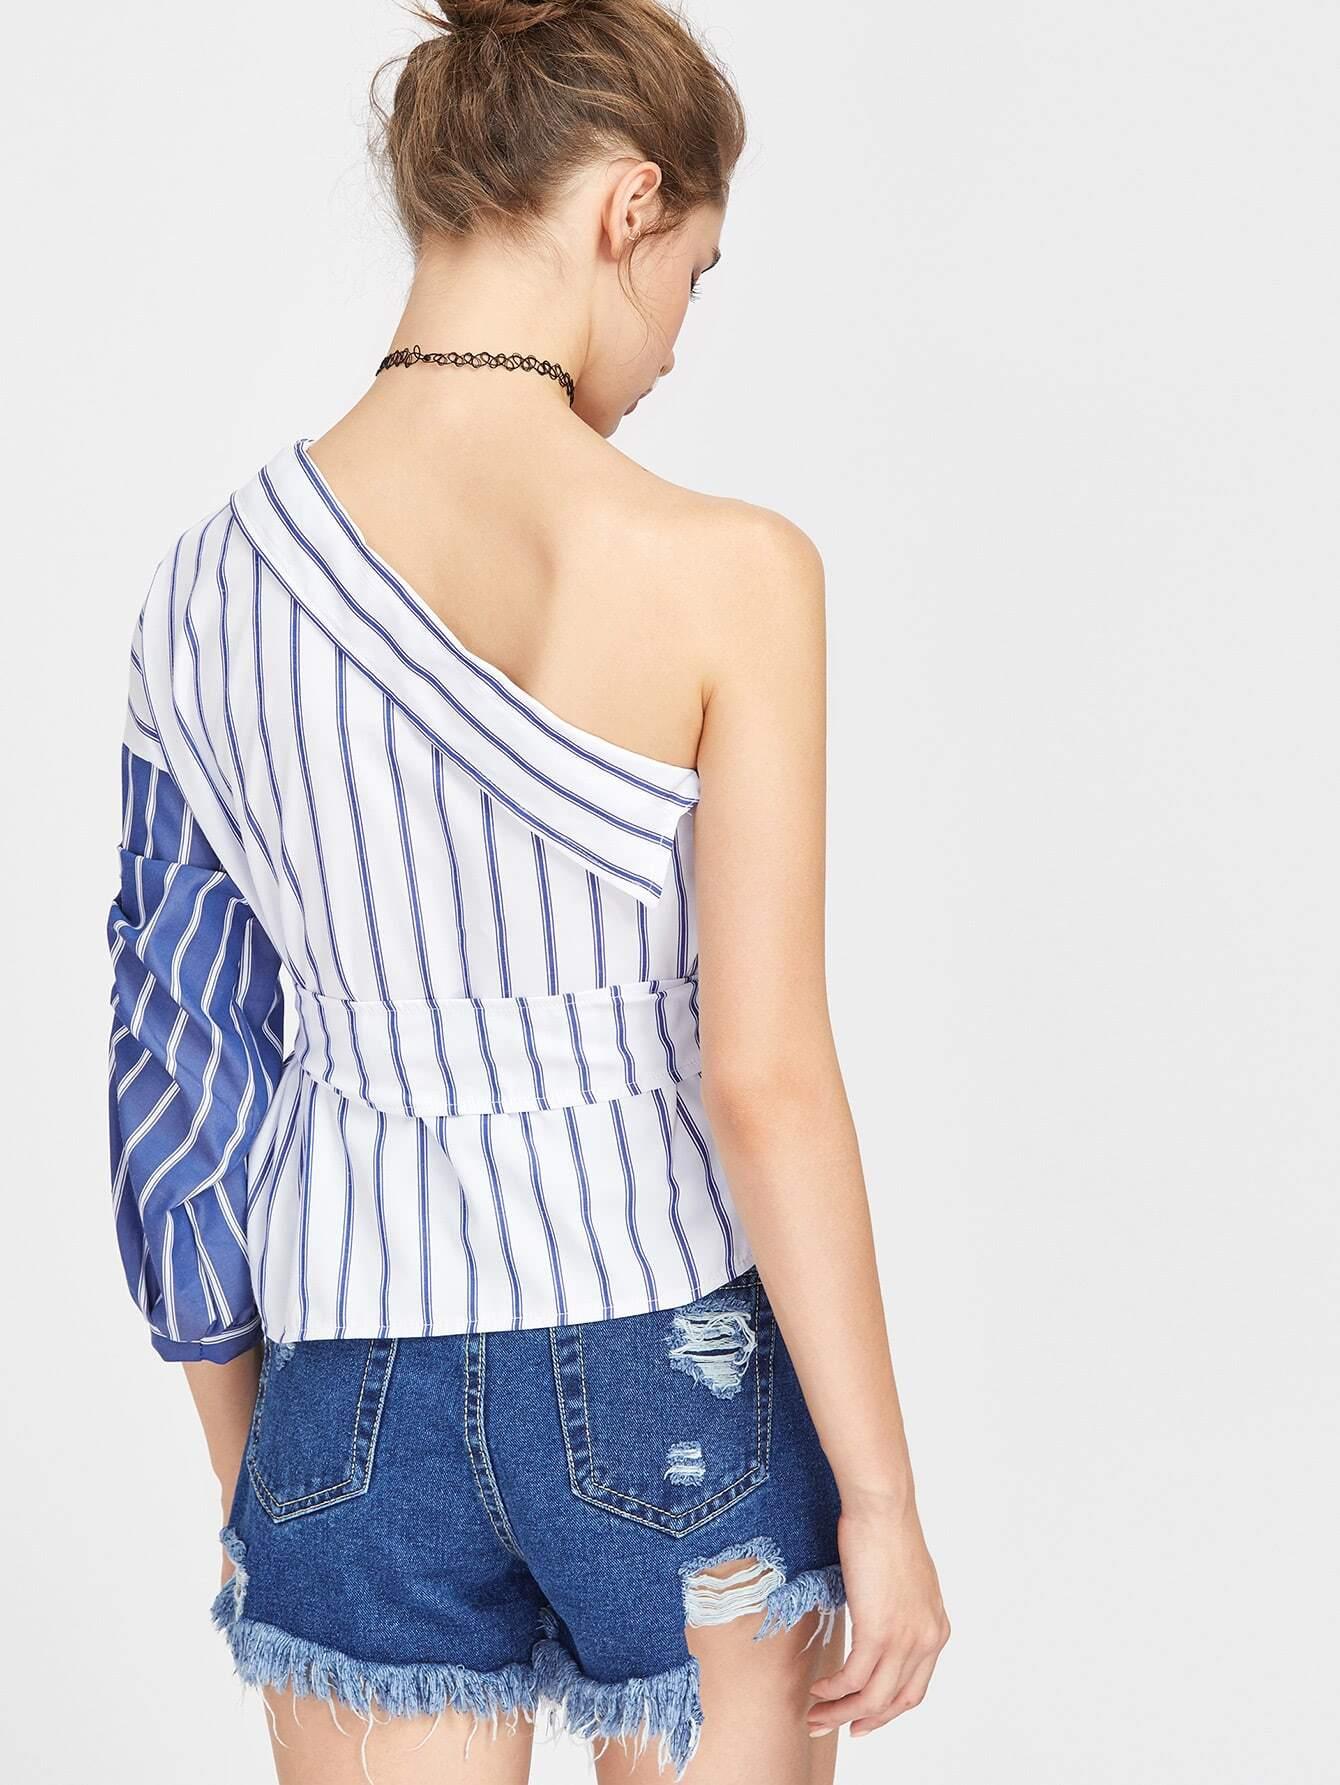 blouse170411107_2